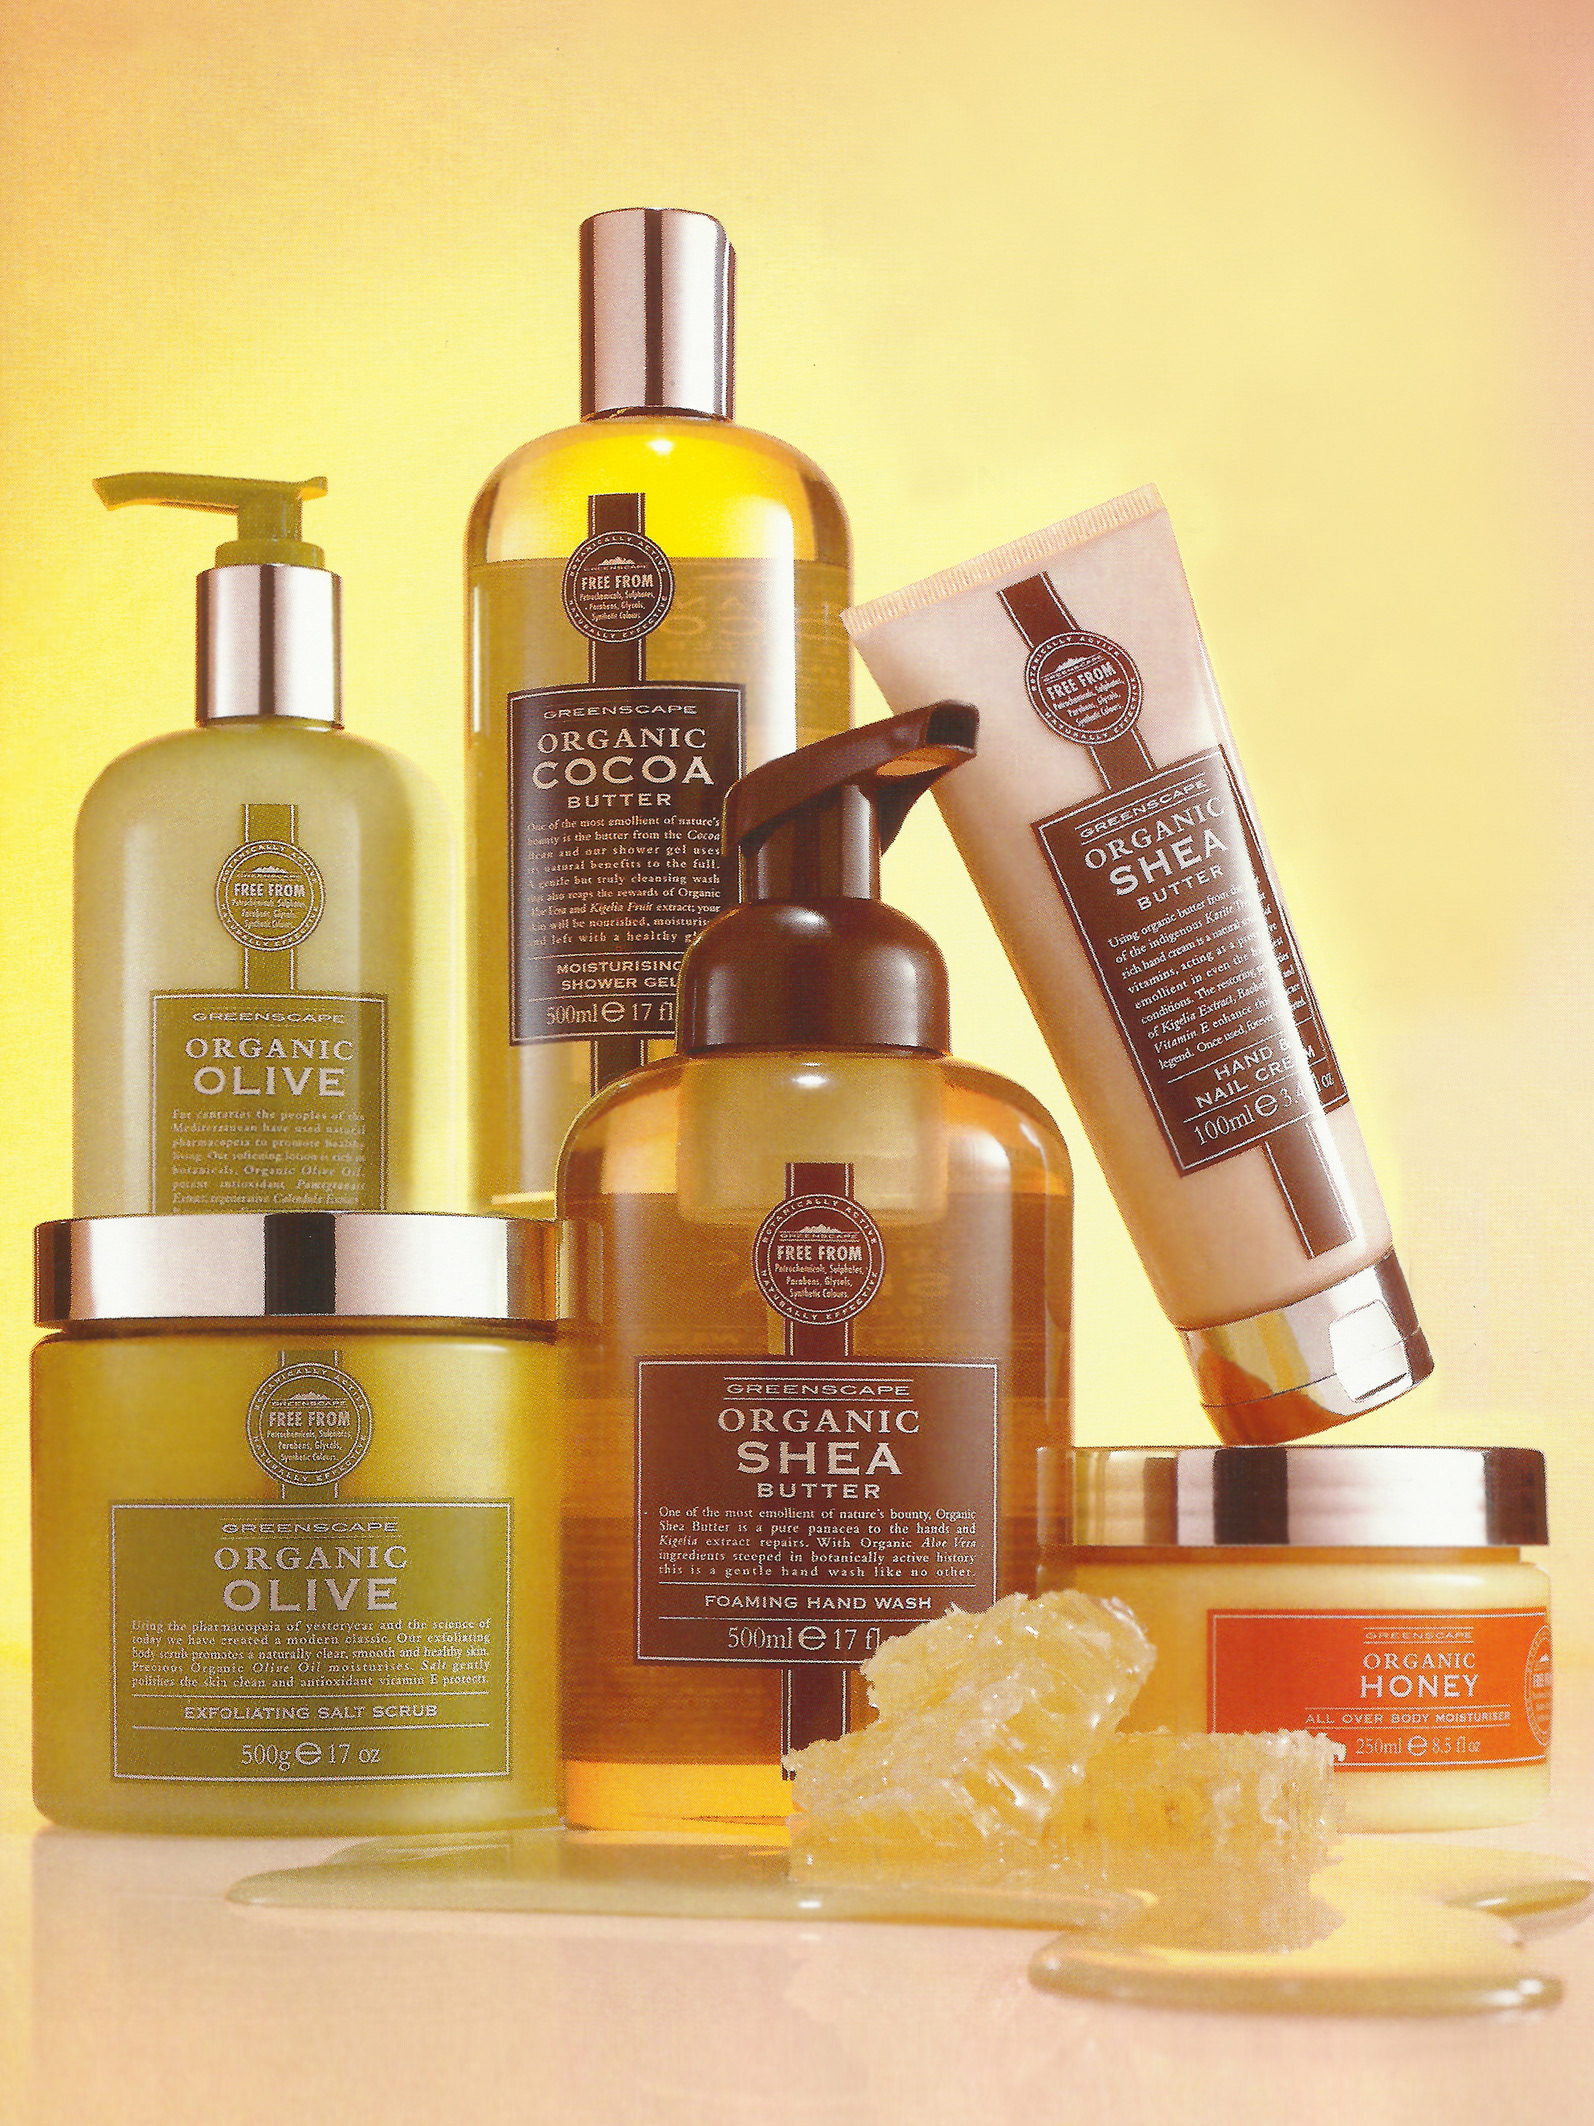 Greenscape Organic Skin Care